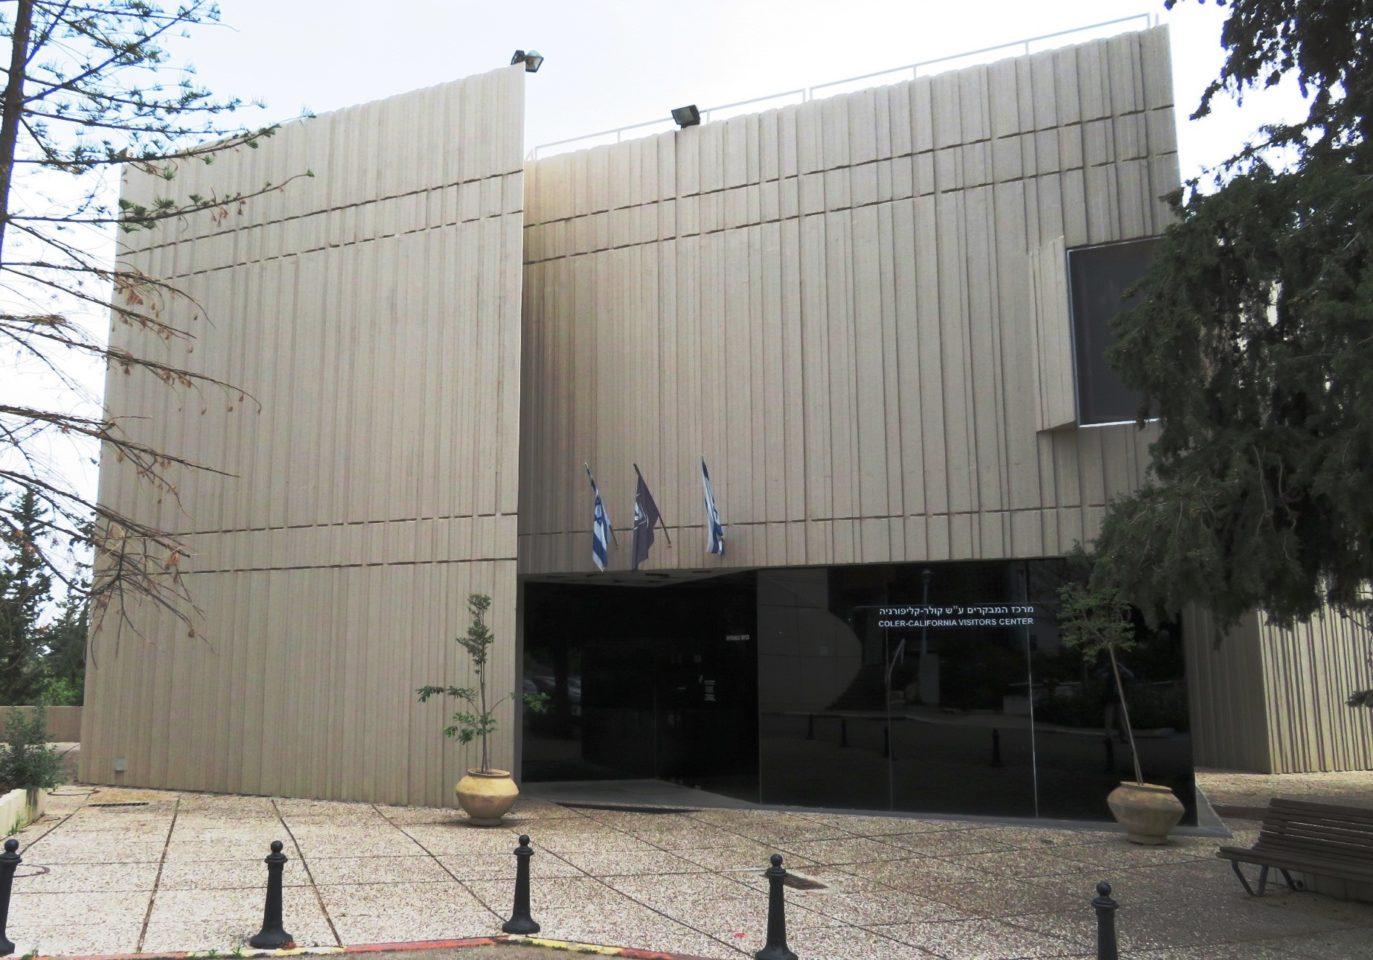 Technion: Visitor's Center on the Technion campus